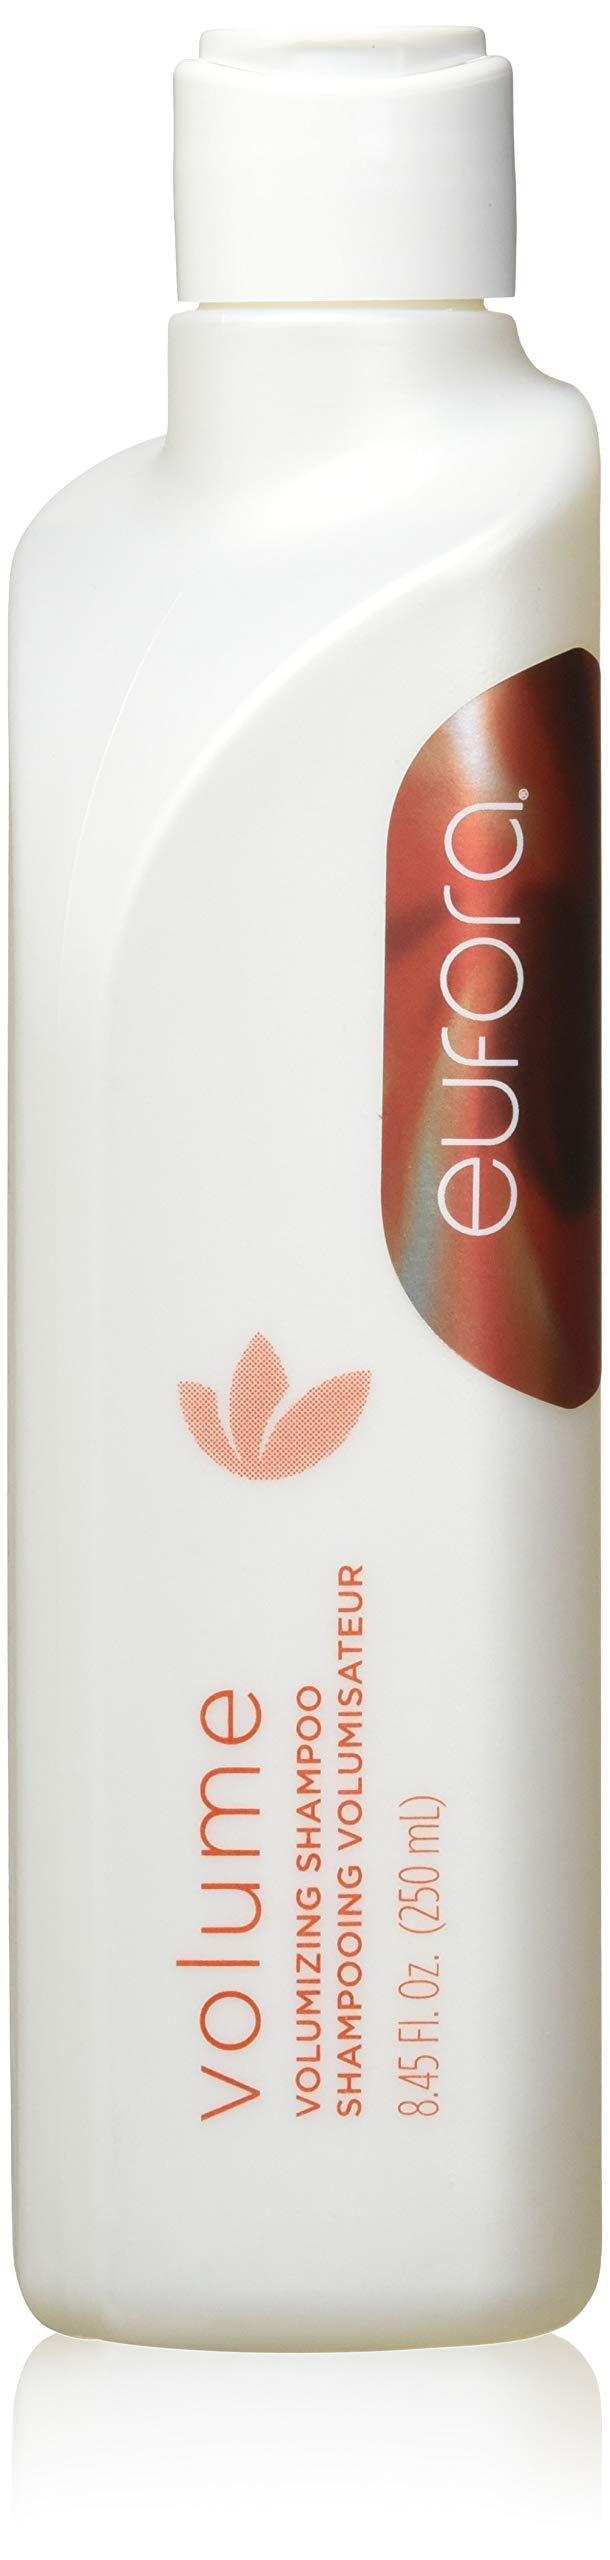 Eufora Volume Volumizing Shampoo, 8.45 Ounce